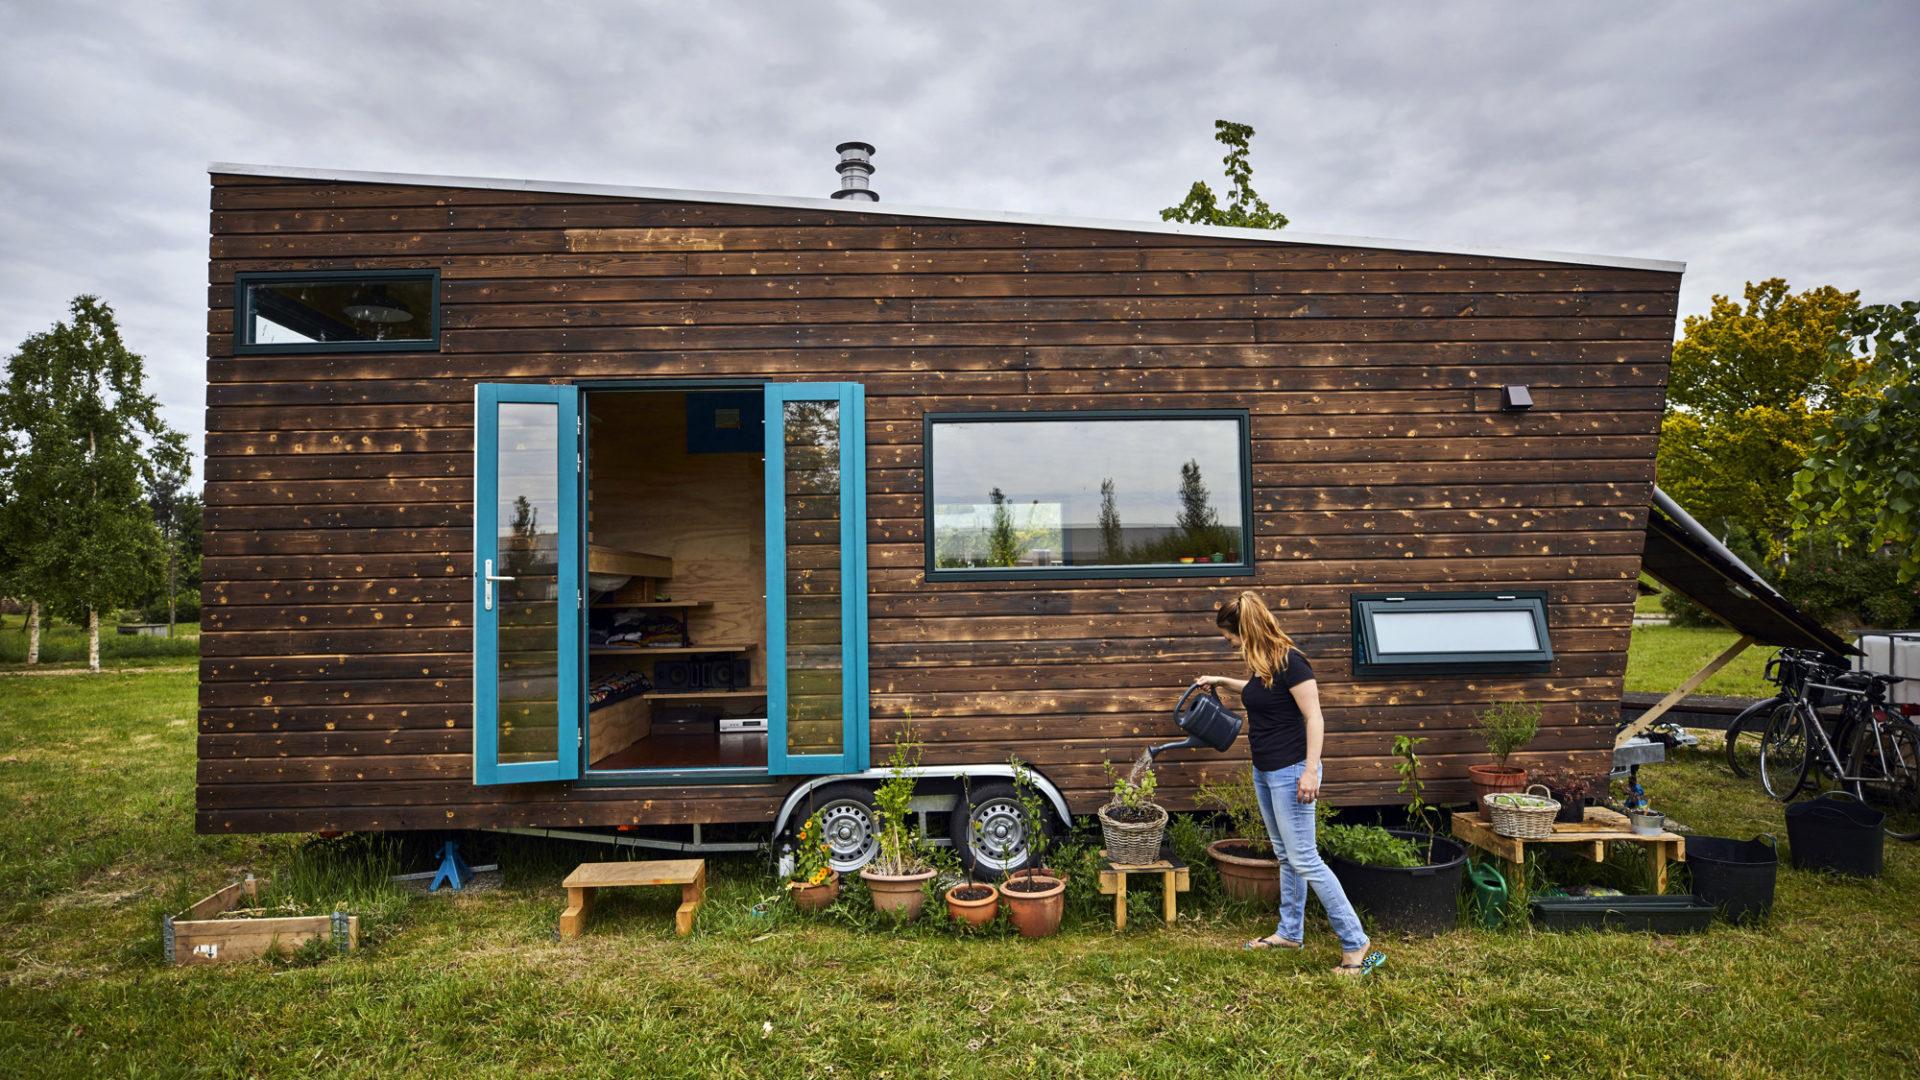 tiny house op concept house village rotterdam circulair rotterdam circulair. Black Bedroom Furniture Sets. Home Design Ideas